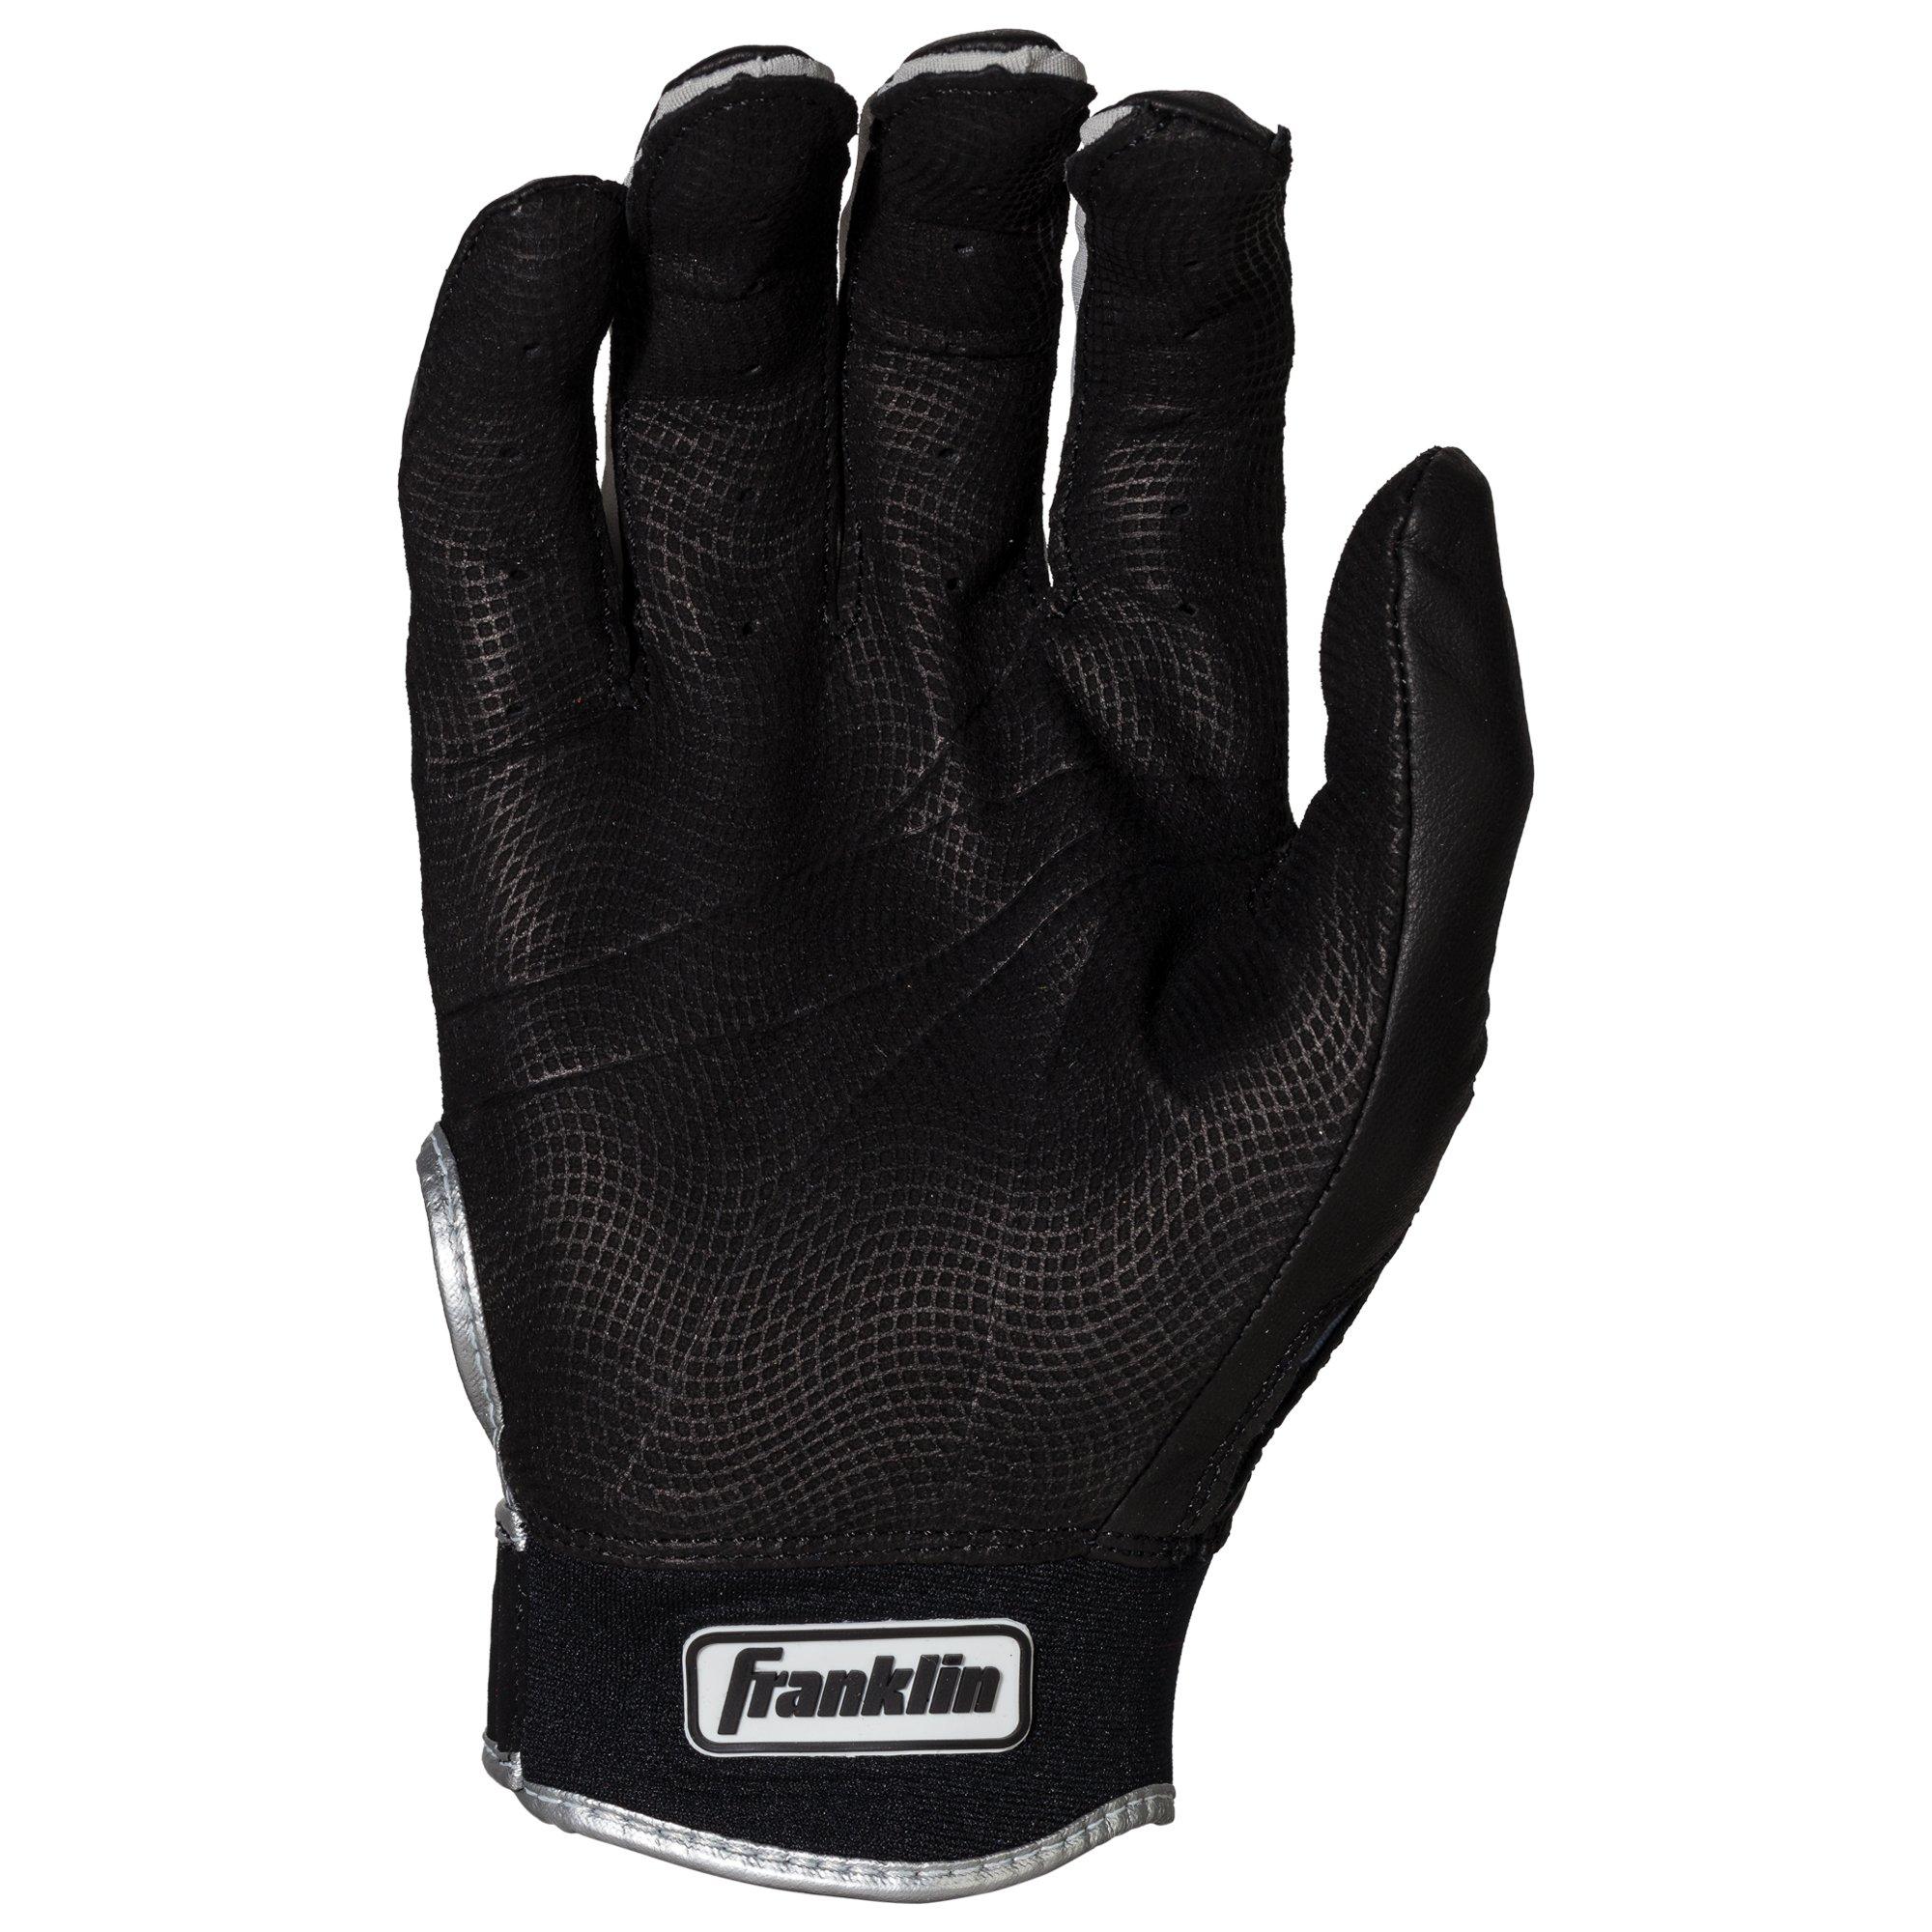 Franklin Sports CFX Pro Digi Series Batting Gloves Black/Black Camo Adult Small by Franklin Sports (Image #3)